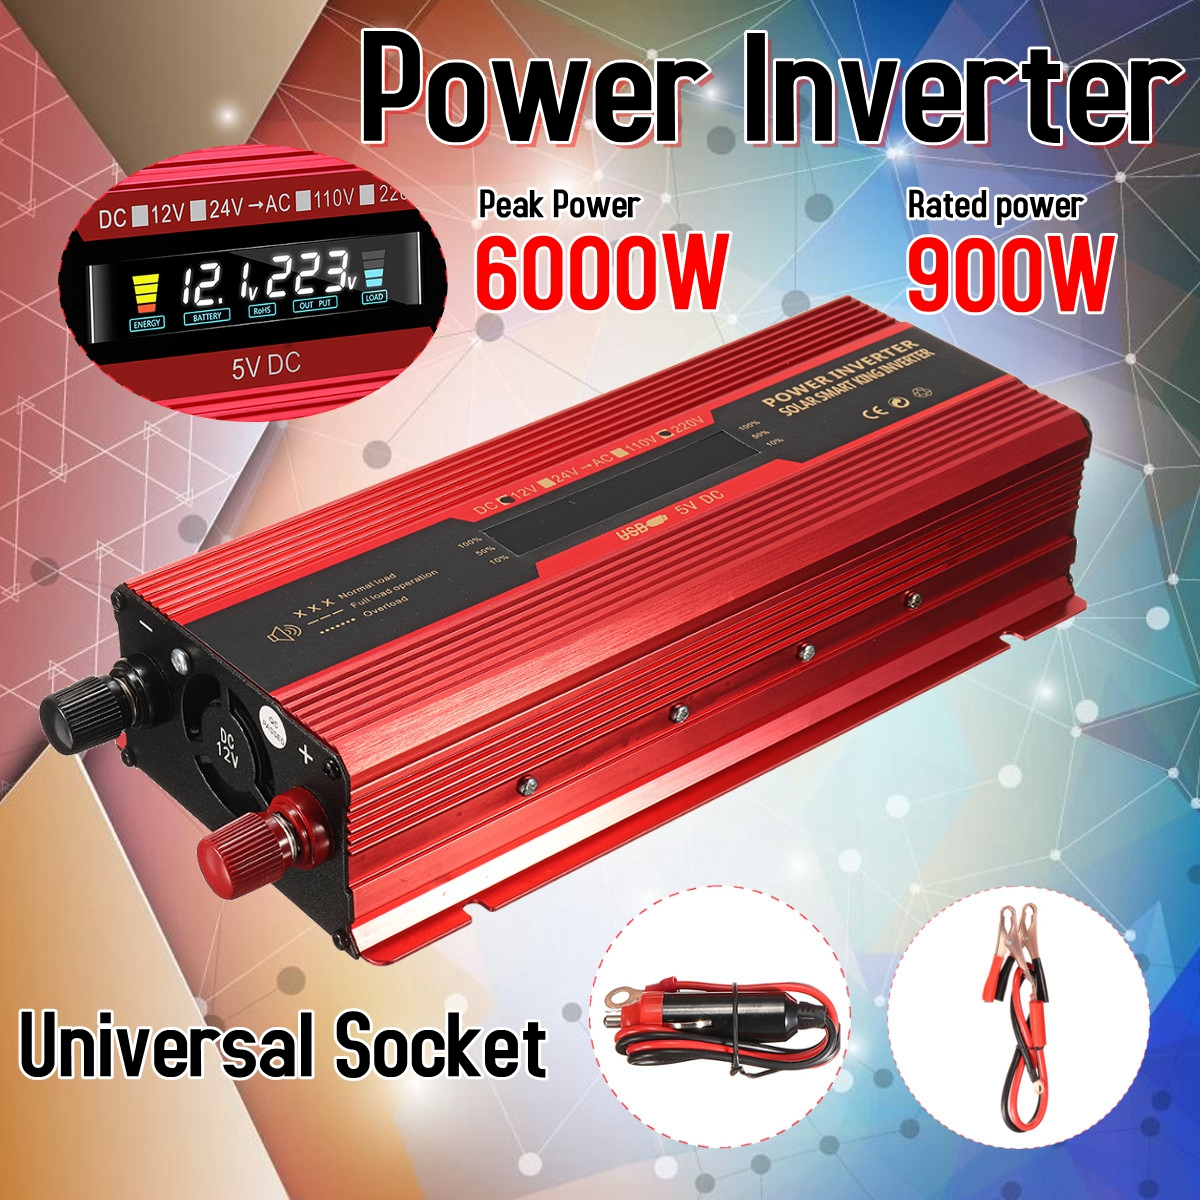 цена на Car Inverter 12V/24V 220V 6000W P eak Power Inverter Voltage Convertor Transformer DC 12V/24V To AC 220V Inversor LCD Display